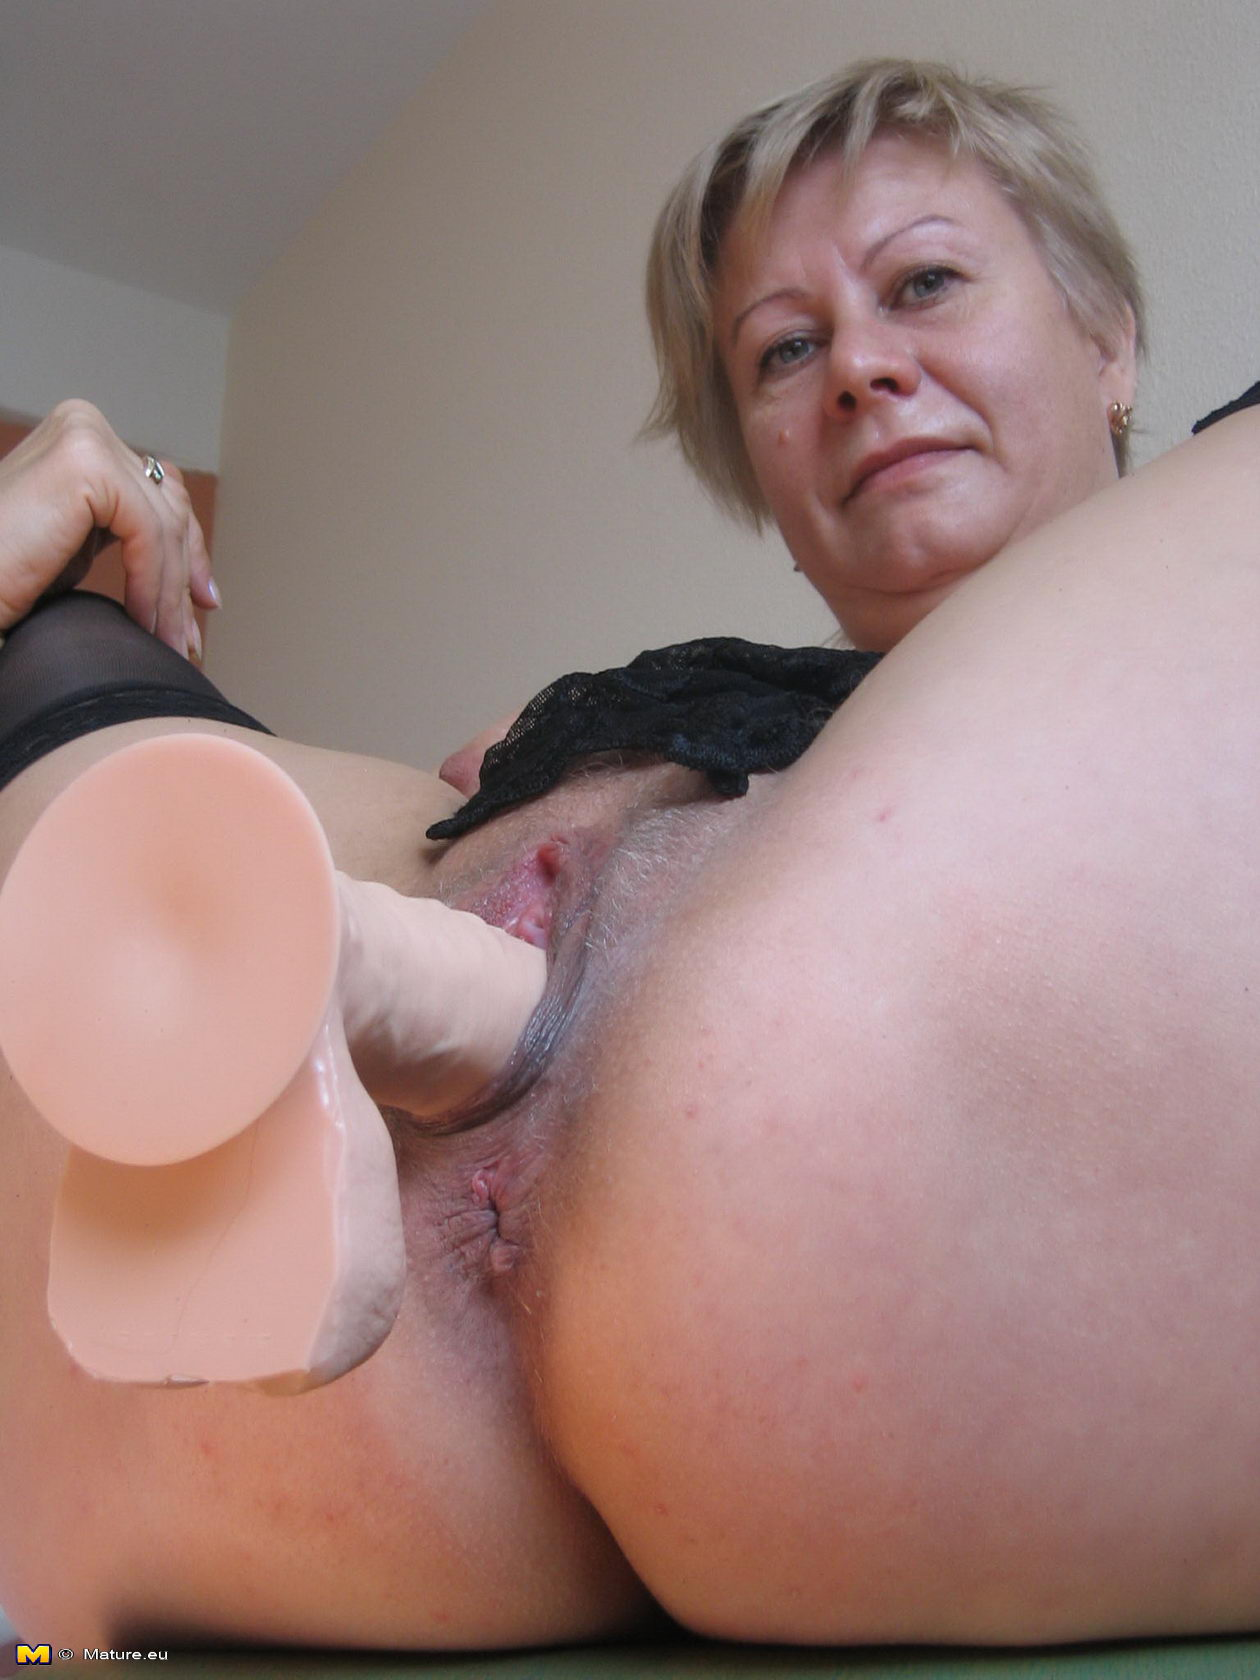 Оргазм вагины порно онлайн